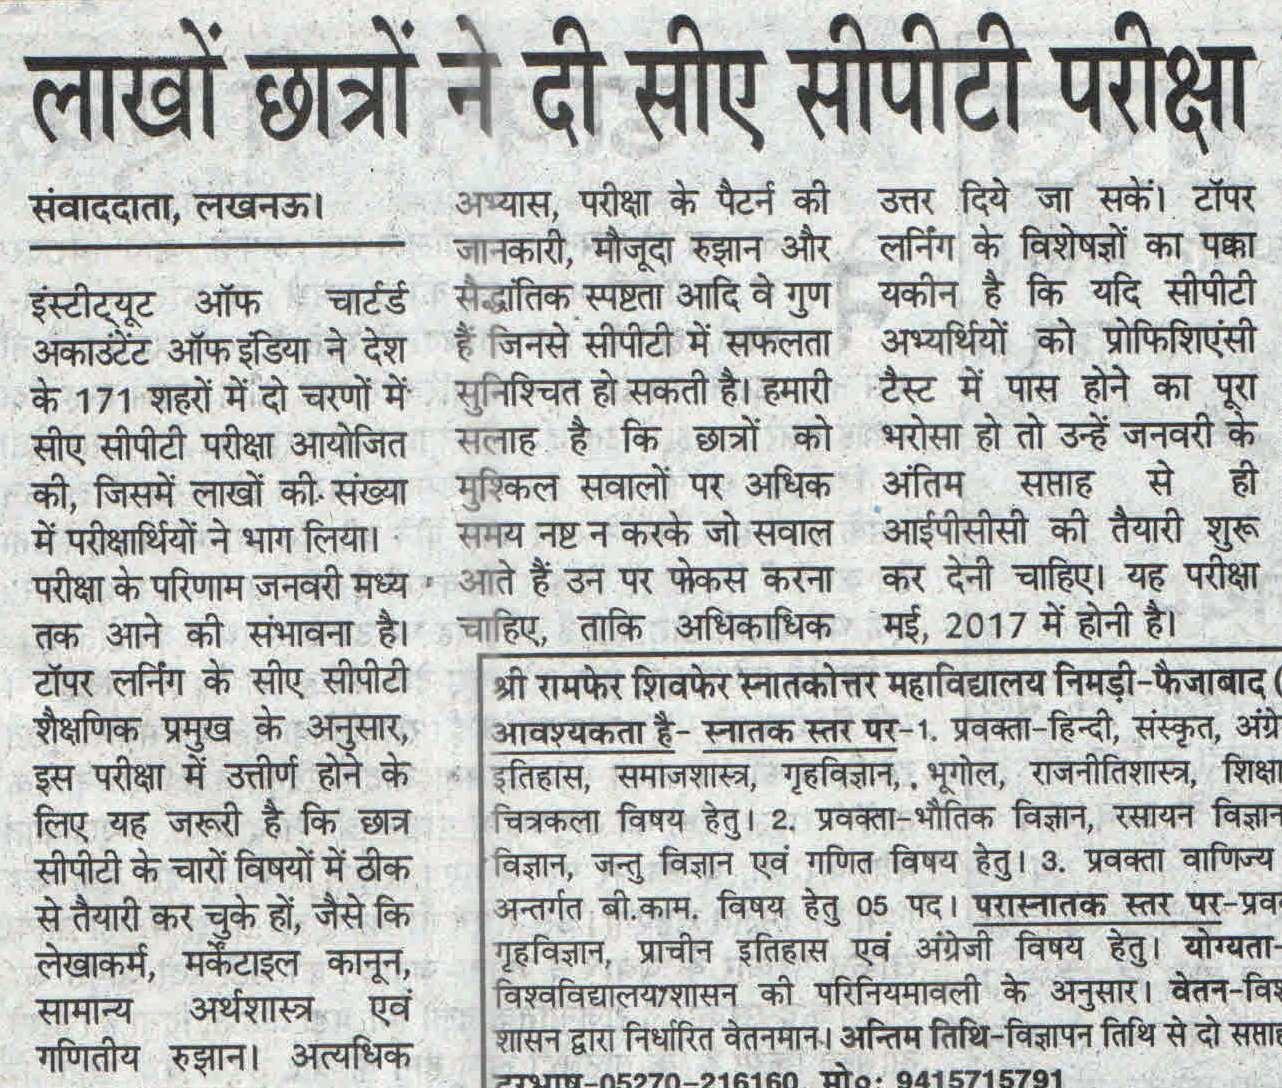 Swatantra Bharat, 22/12/2016